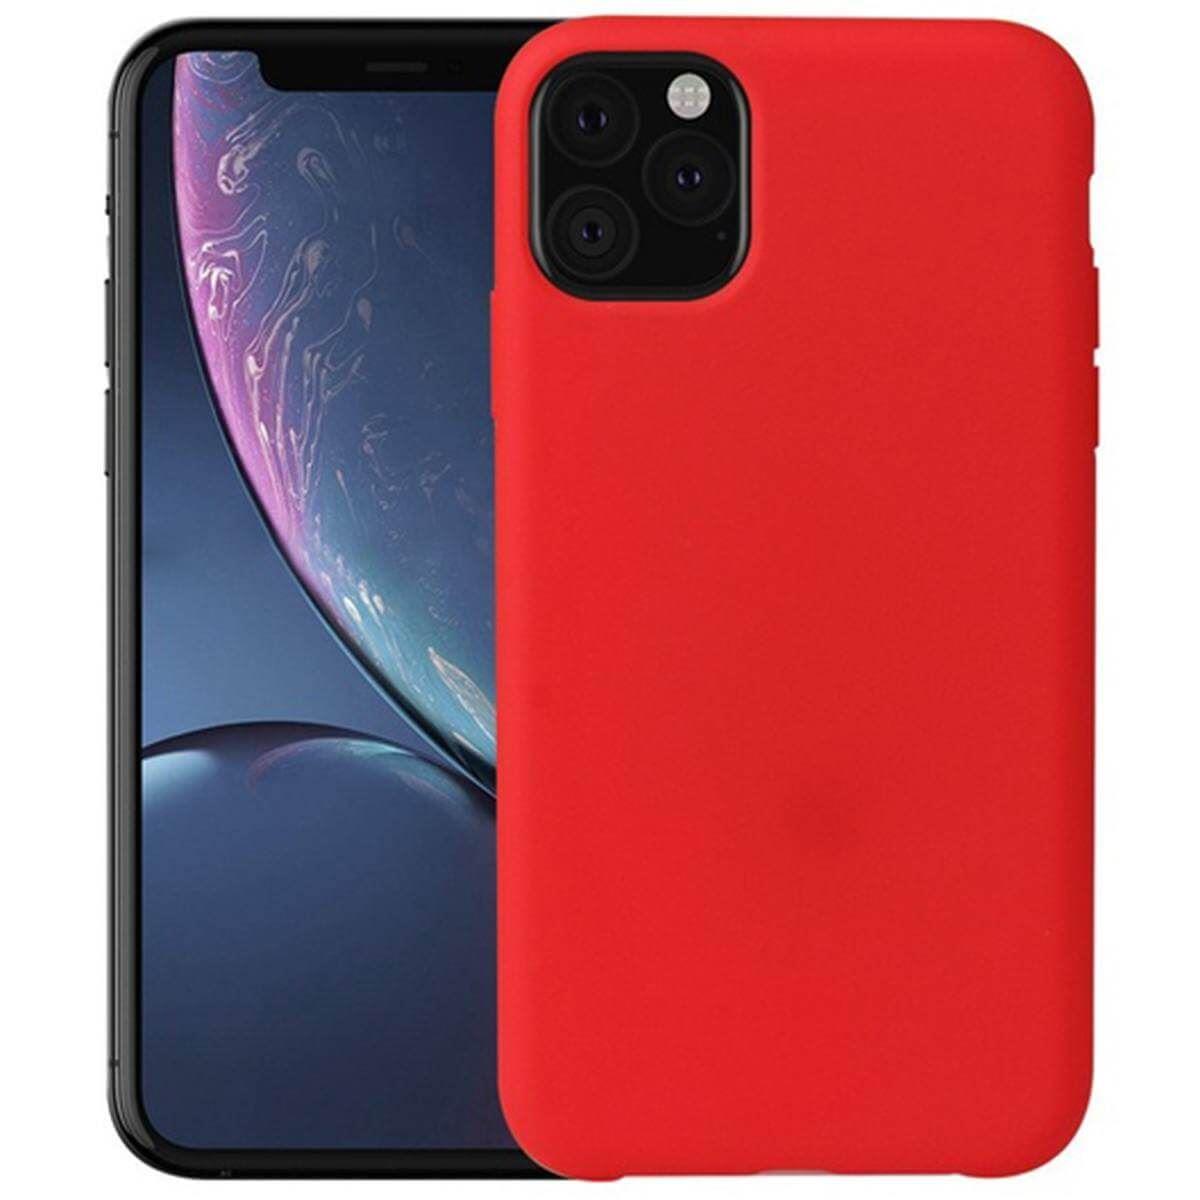 Leather-Slim-Case-Apple-iPhone-10-8-7-Plus-6s-5-Original-PU-Soft-Silicone-Cover thumbnail 23